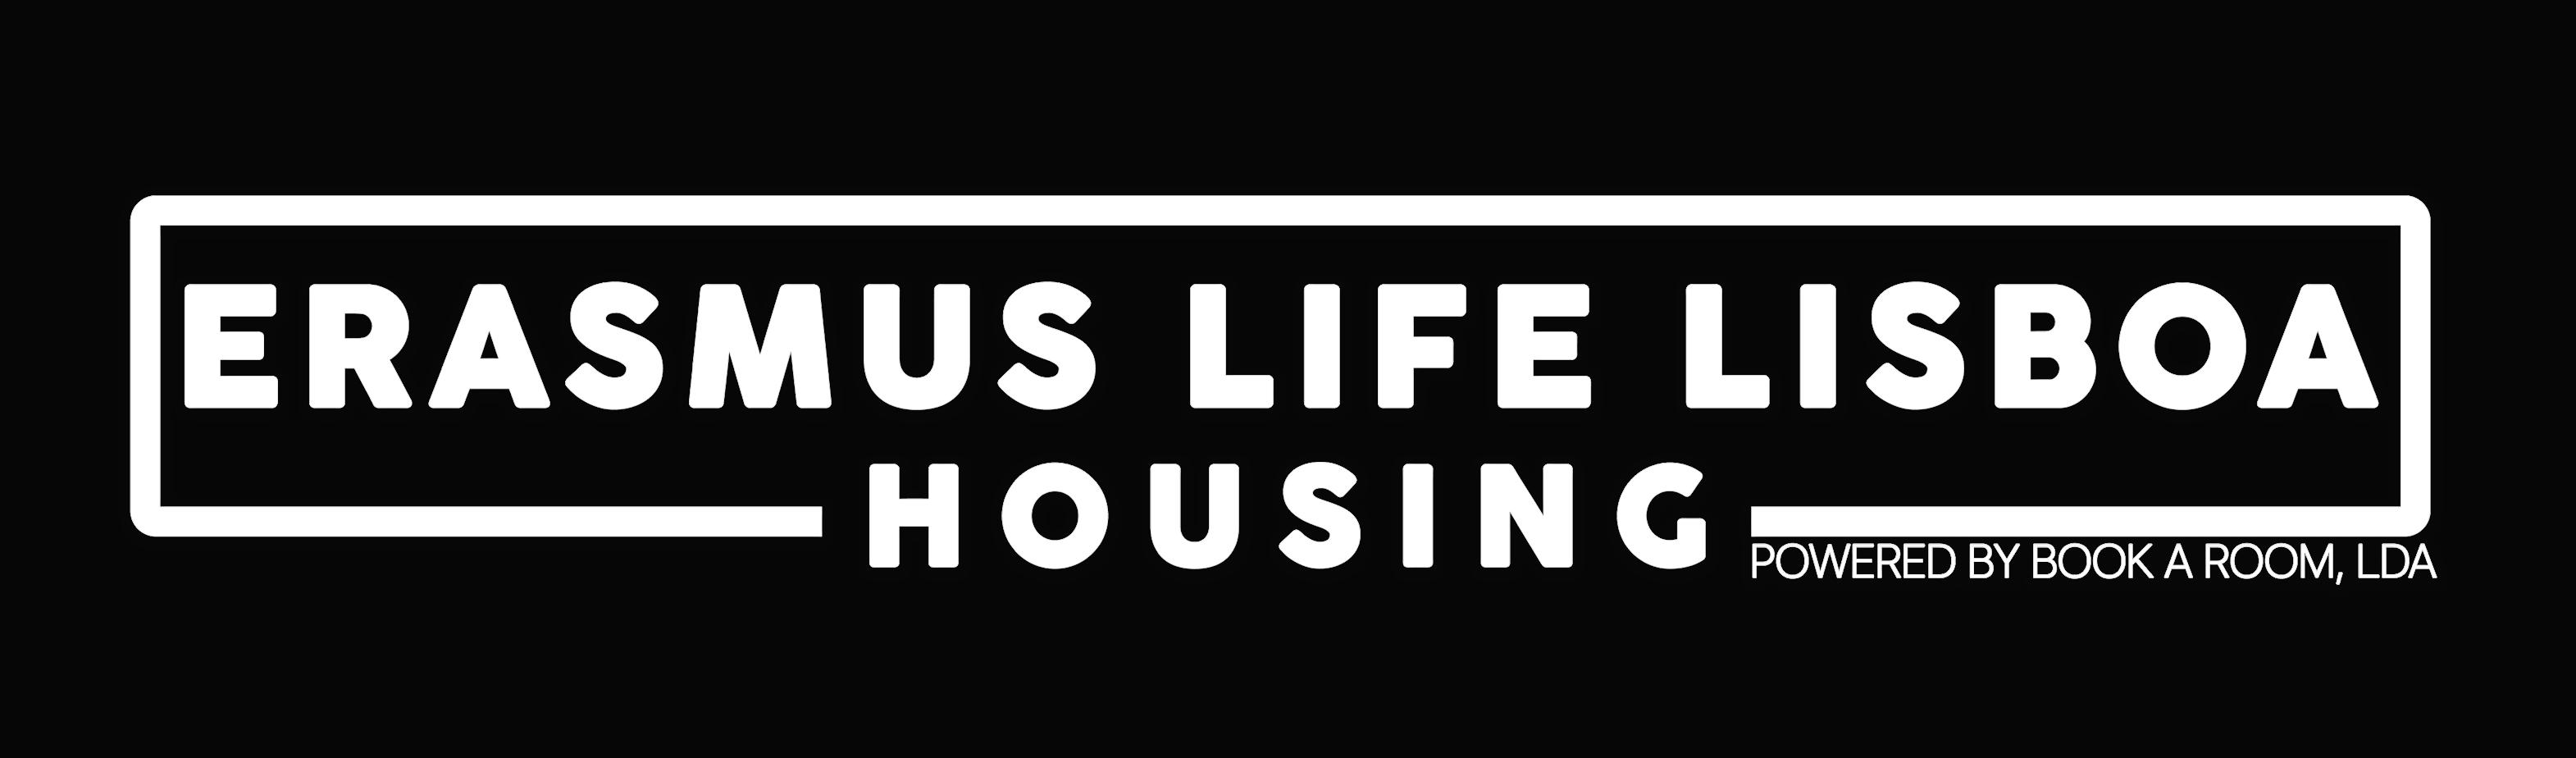 Housing – Erasmus Life Lisboa